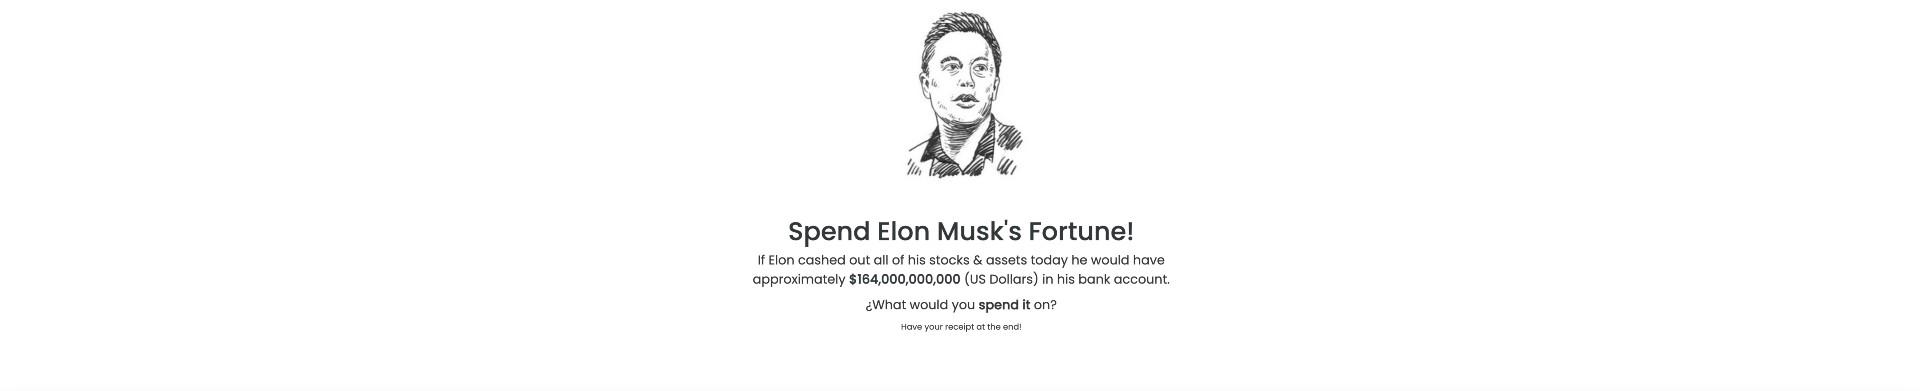 elon-musk-fortune-game